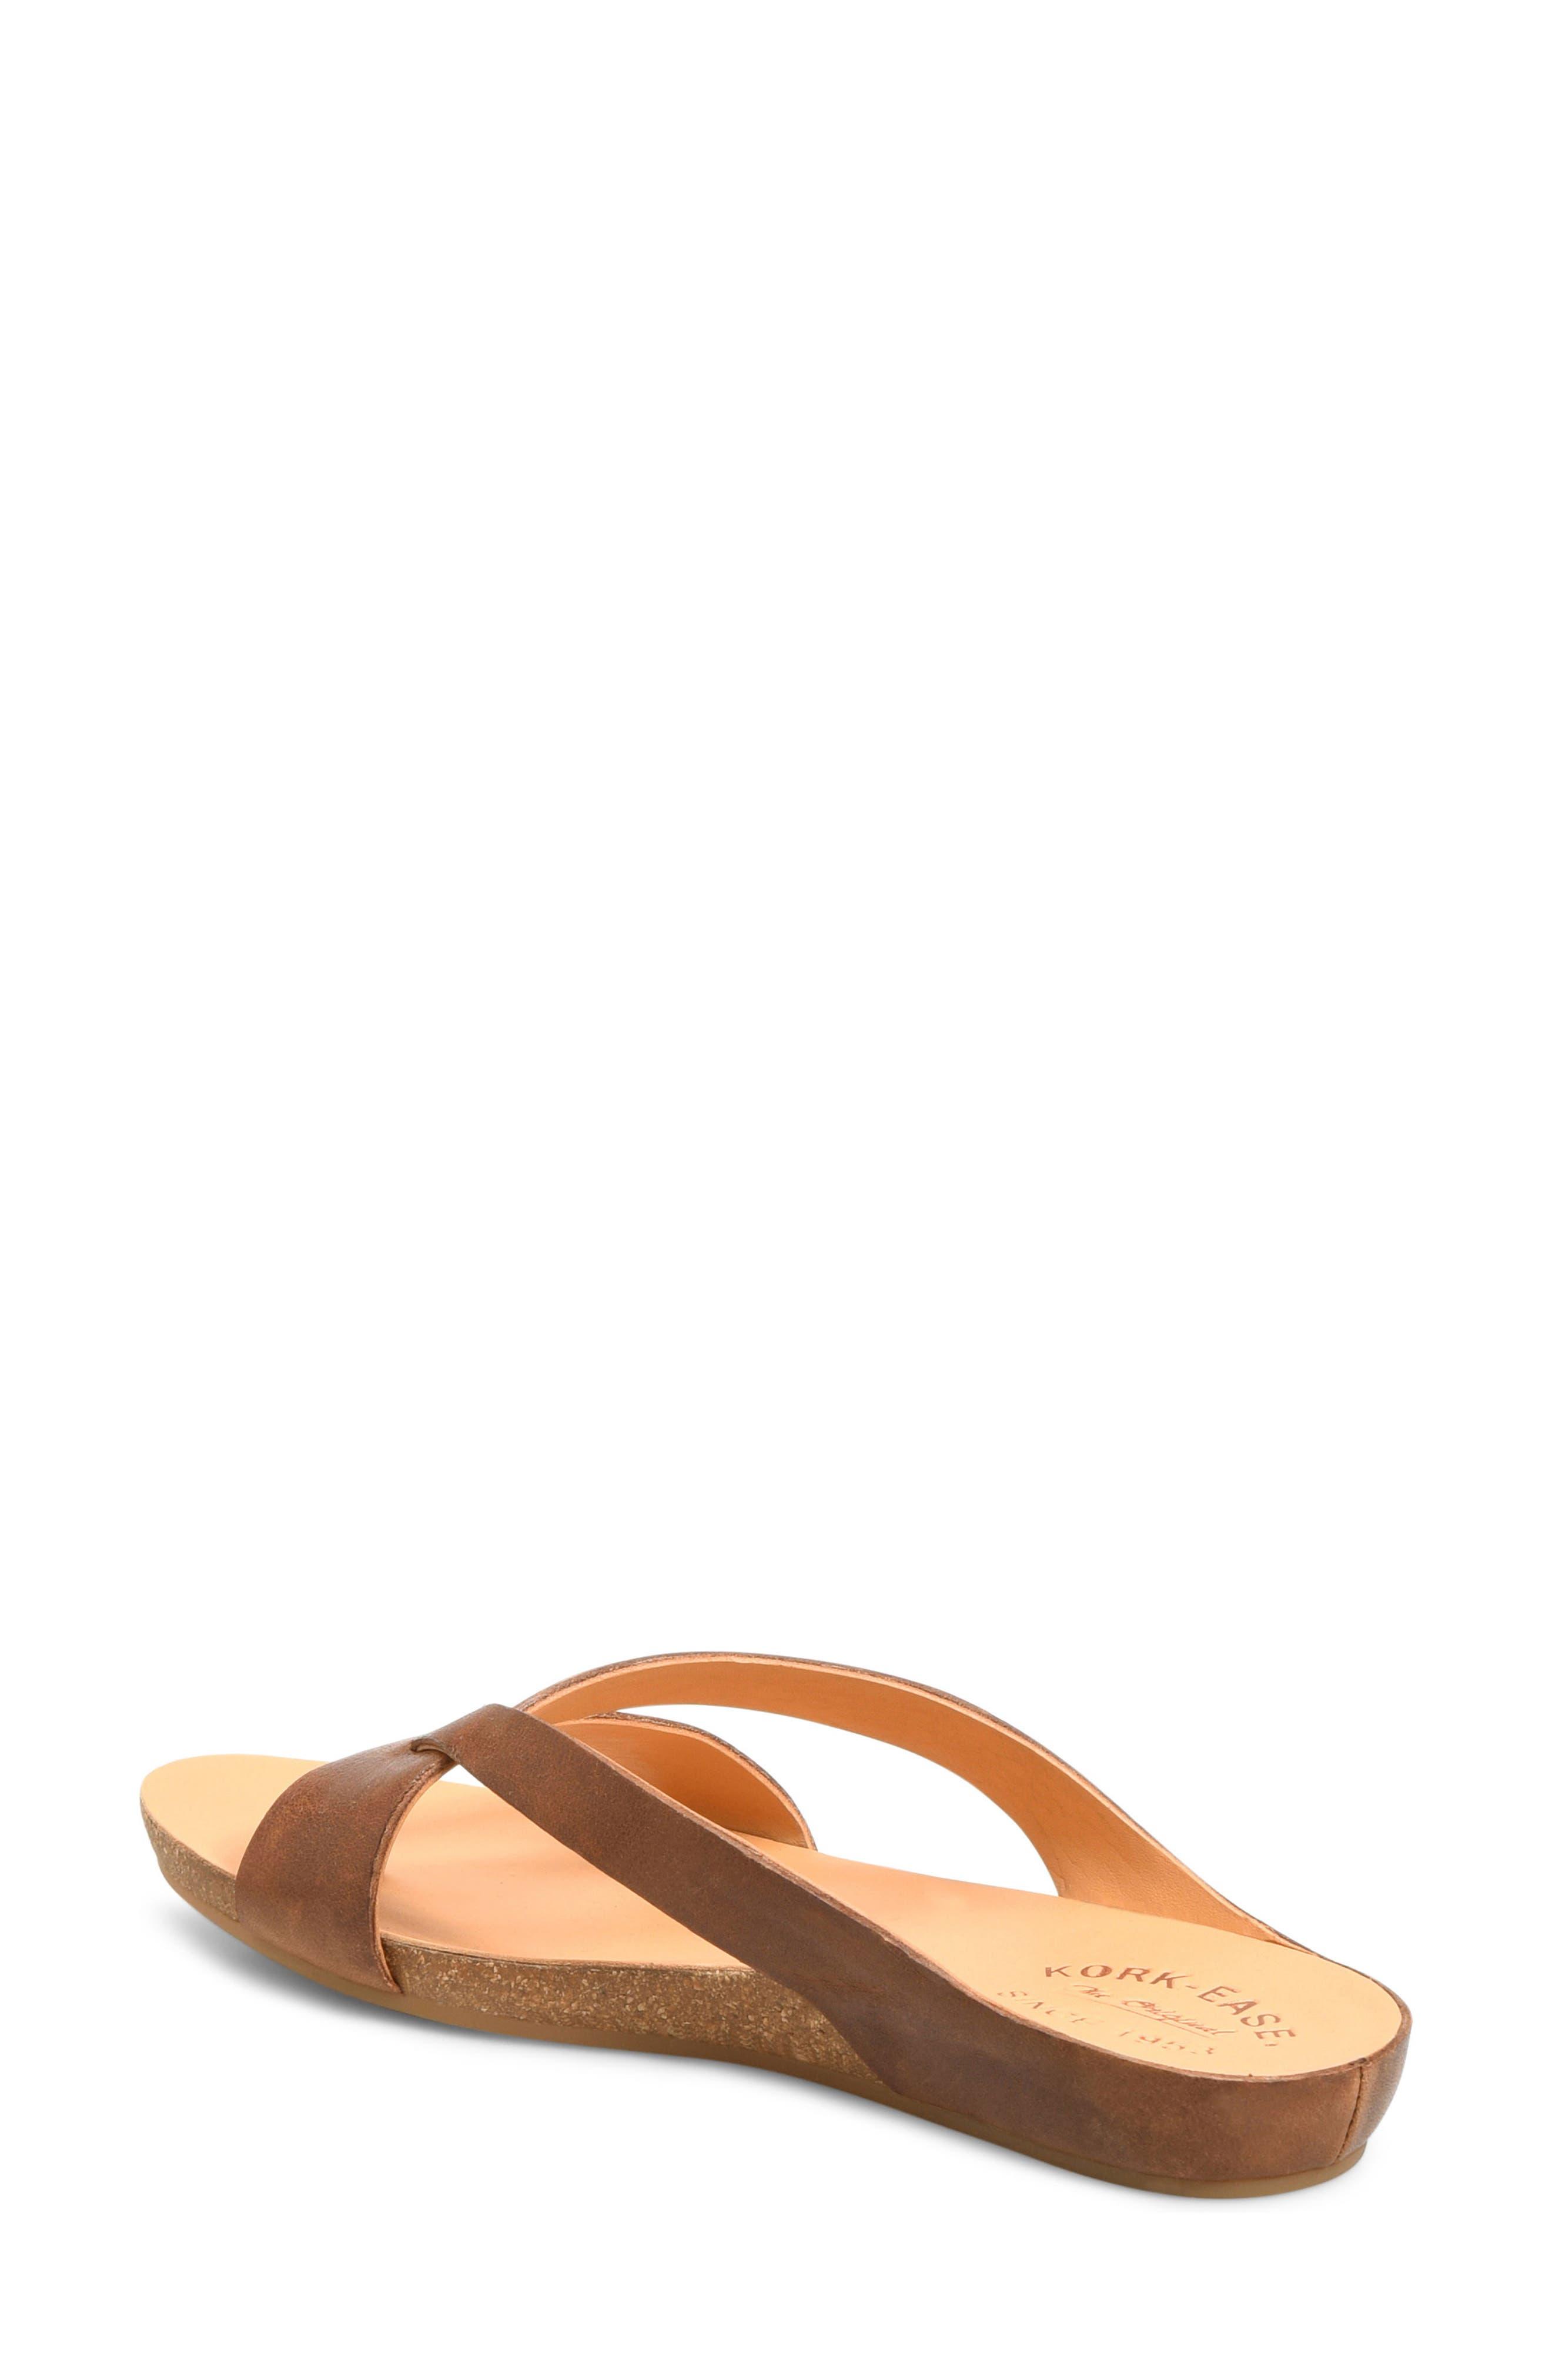 Devoe Sandal,                             Alternate thumbnail 2, color,                             Brown Leather